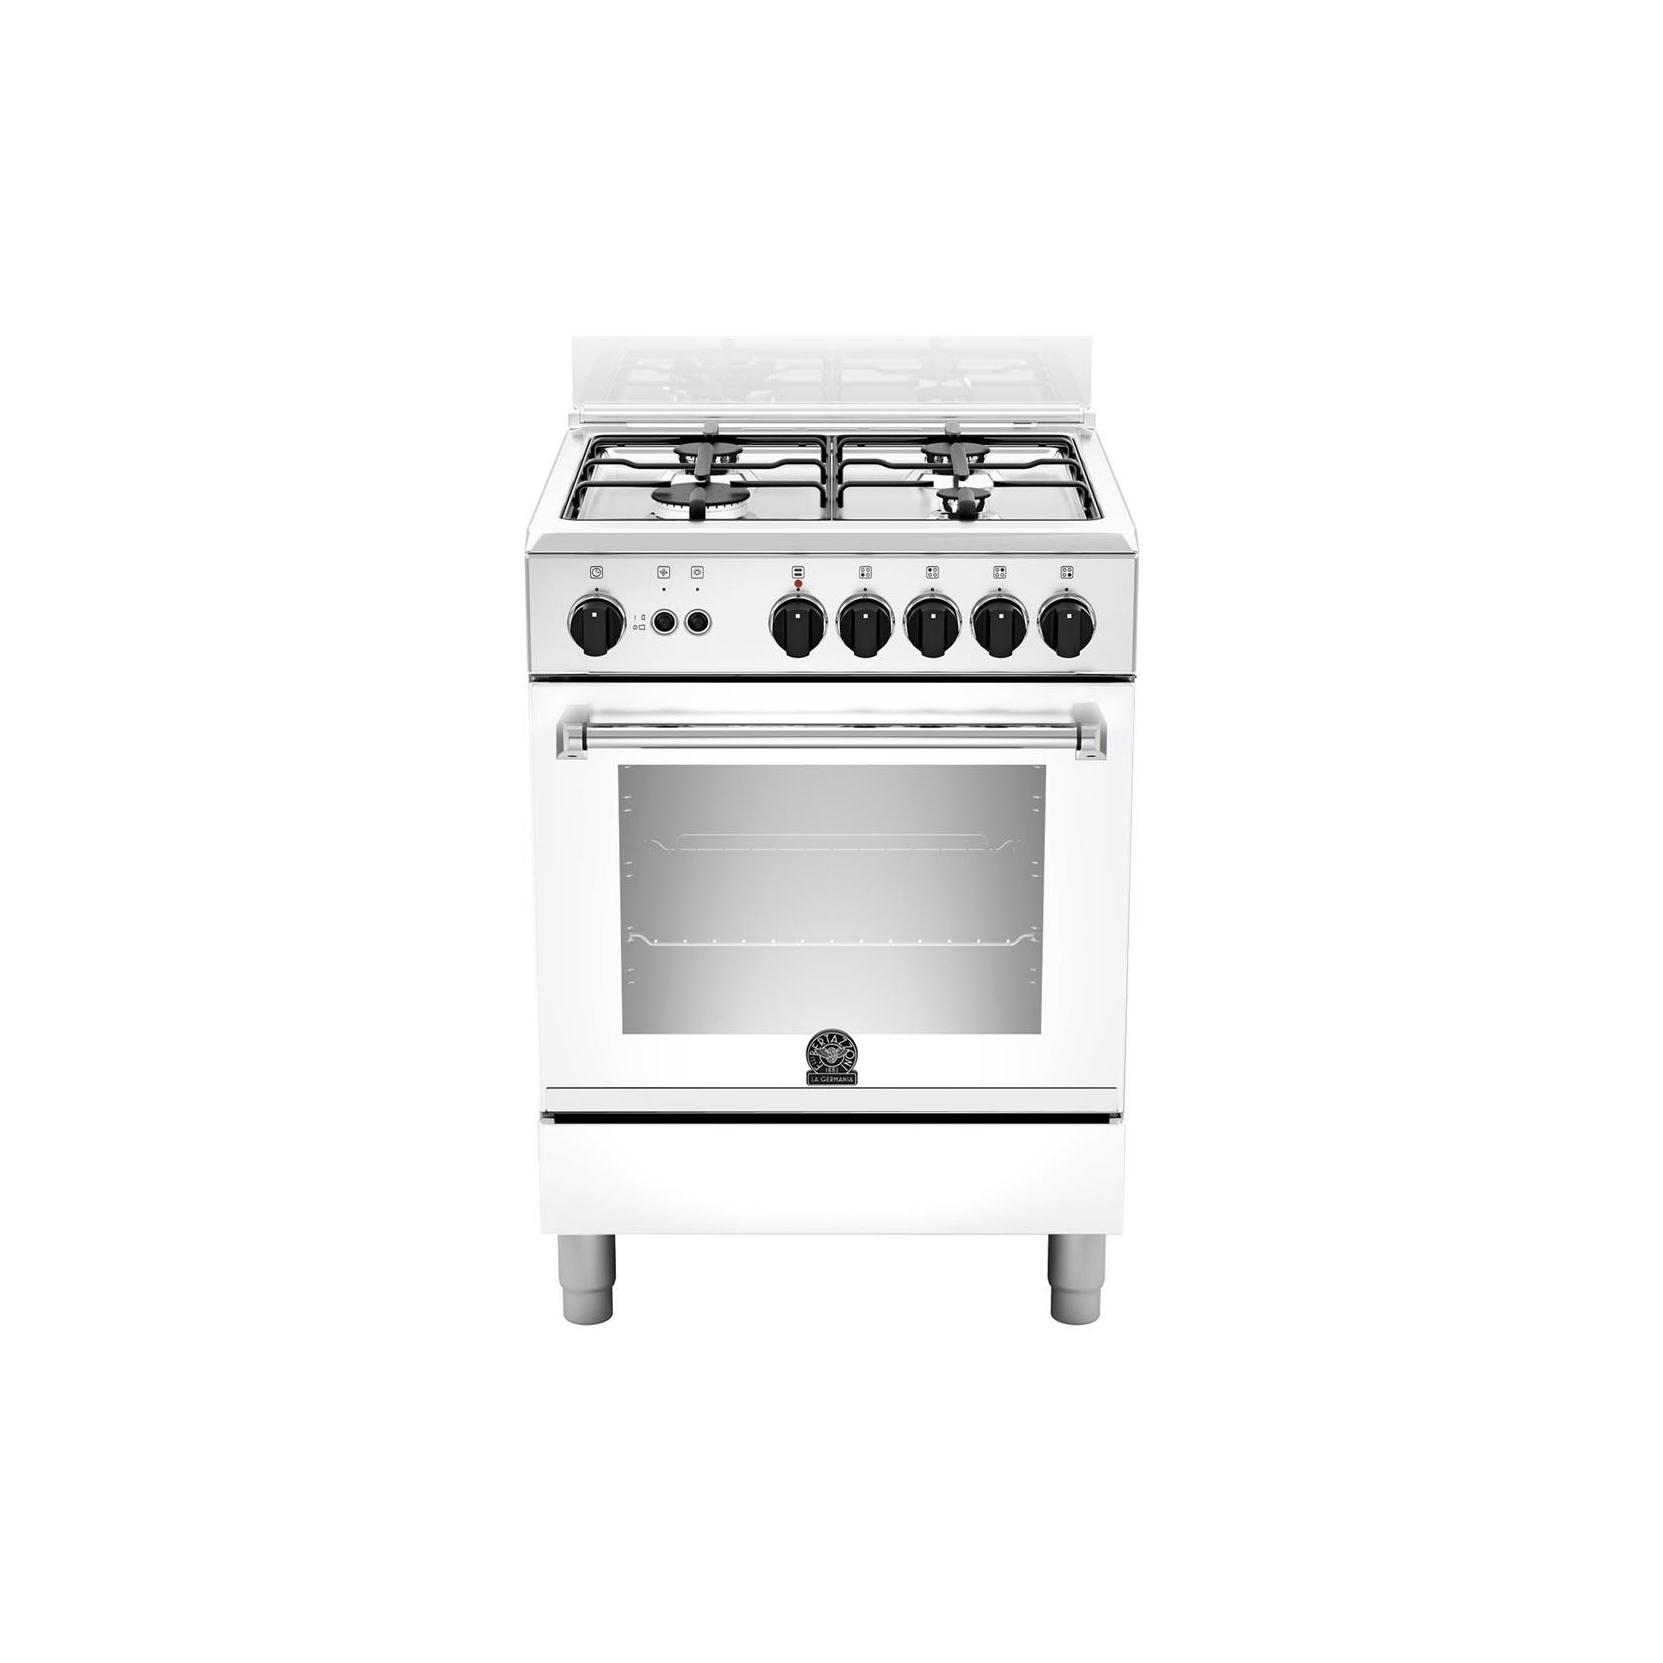 Cucina la germania amn604gevswe 60x60 bianca 4 f a gas forno a gas garanzia italia - Cucine a gas la germania ...